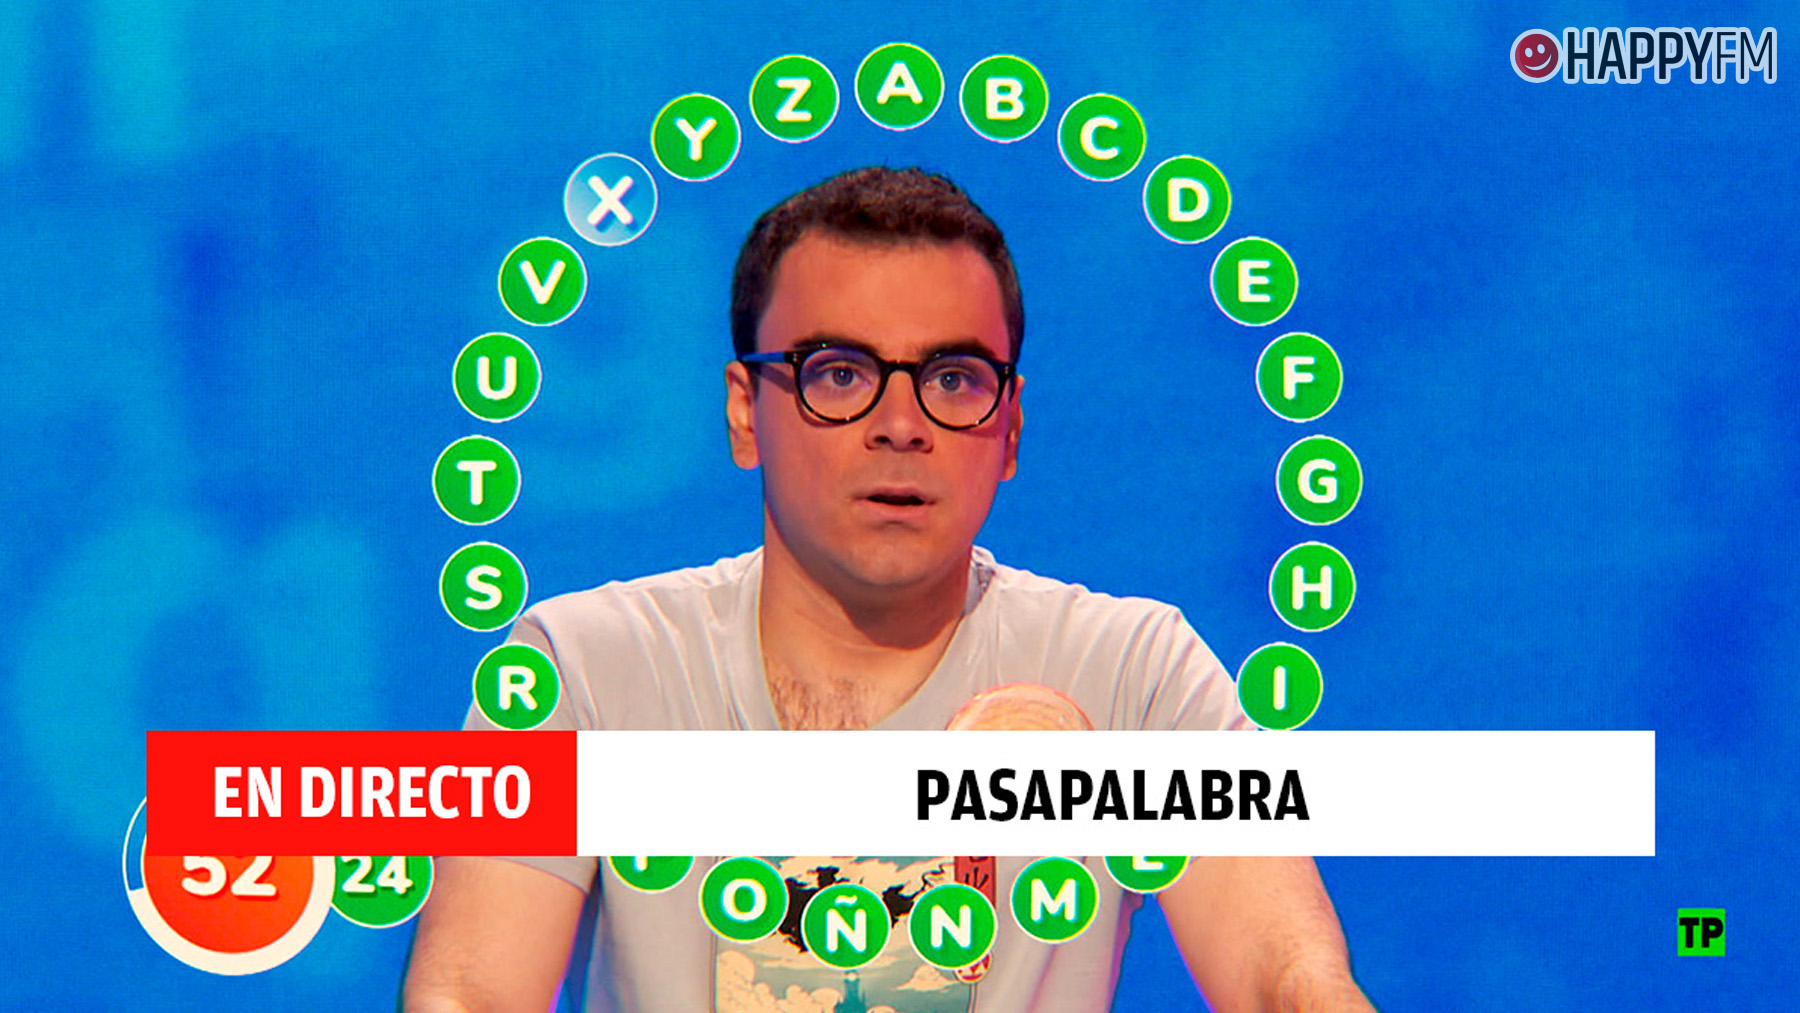 Pablo Díaz en Pasapalabra en directo